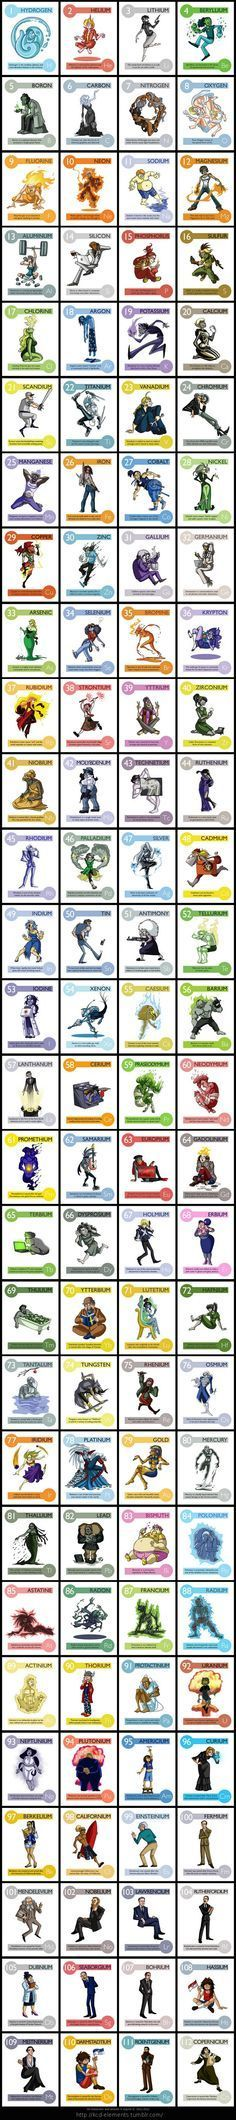 29 best Classification   Tableau périodique images on Pinterest - best of periodic table puns